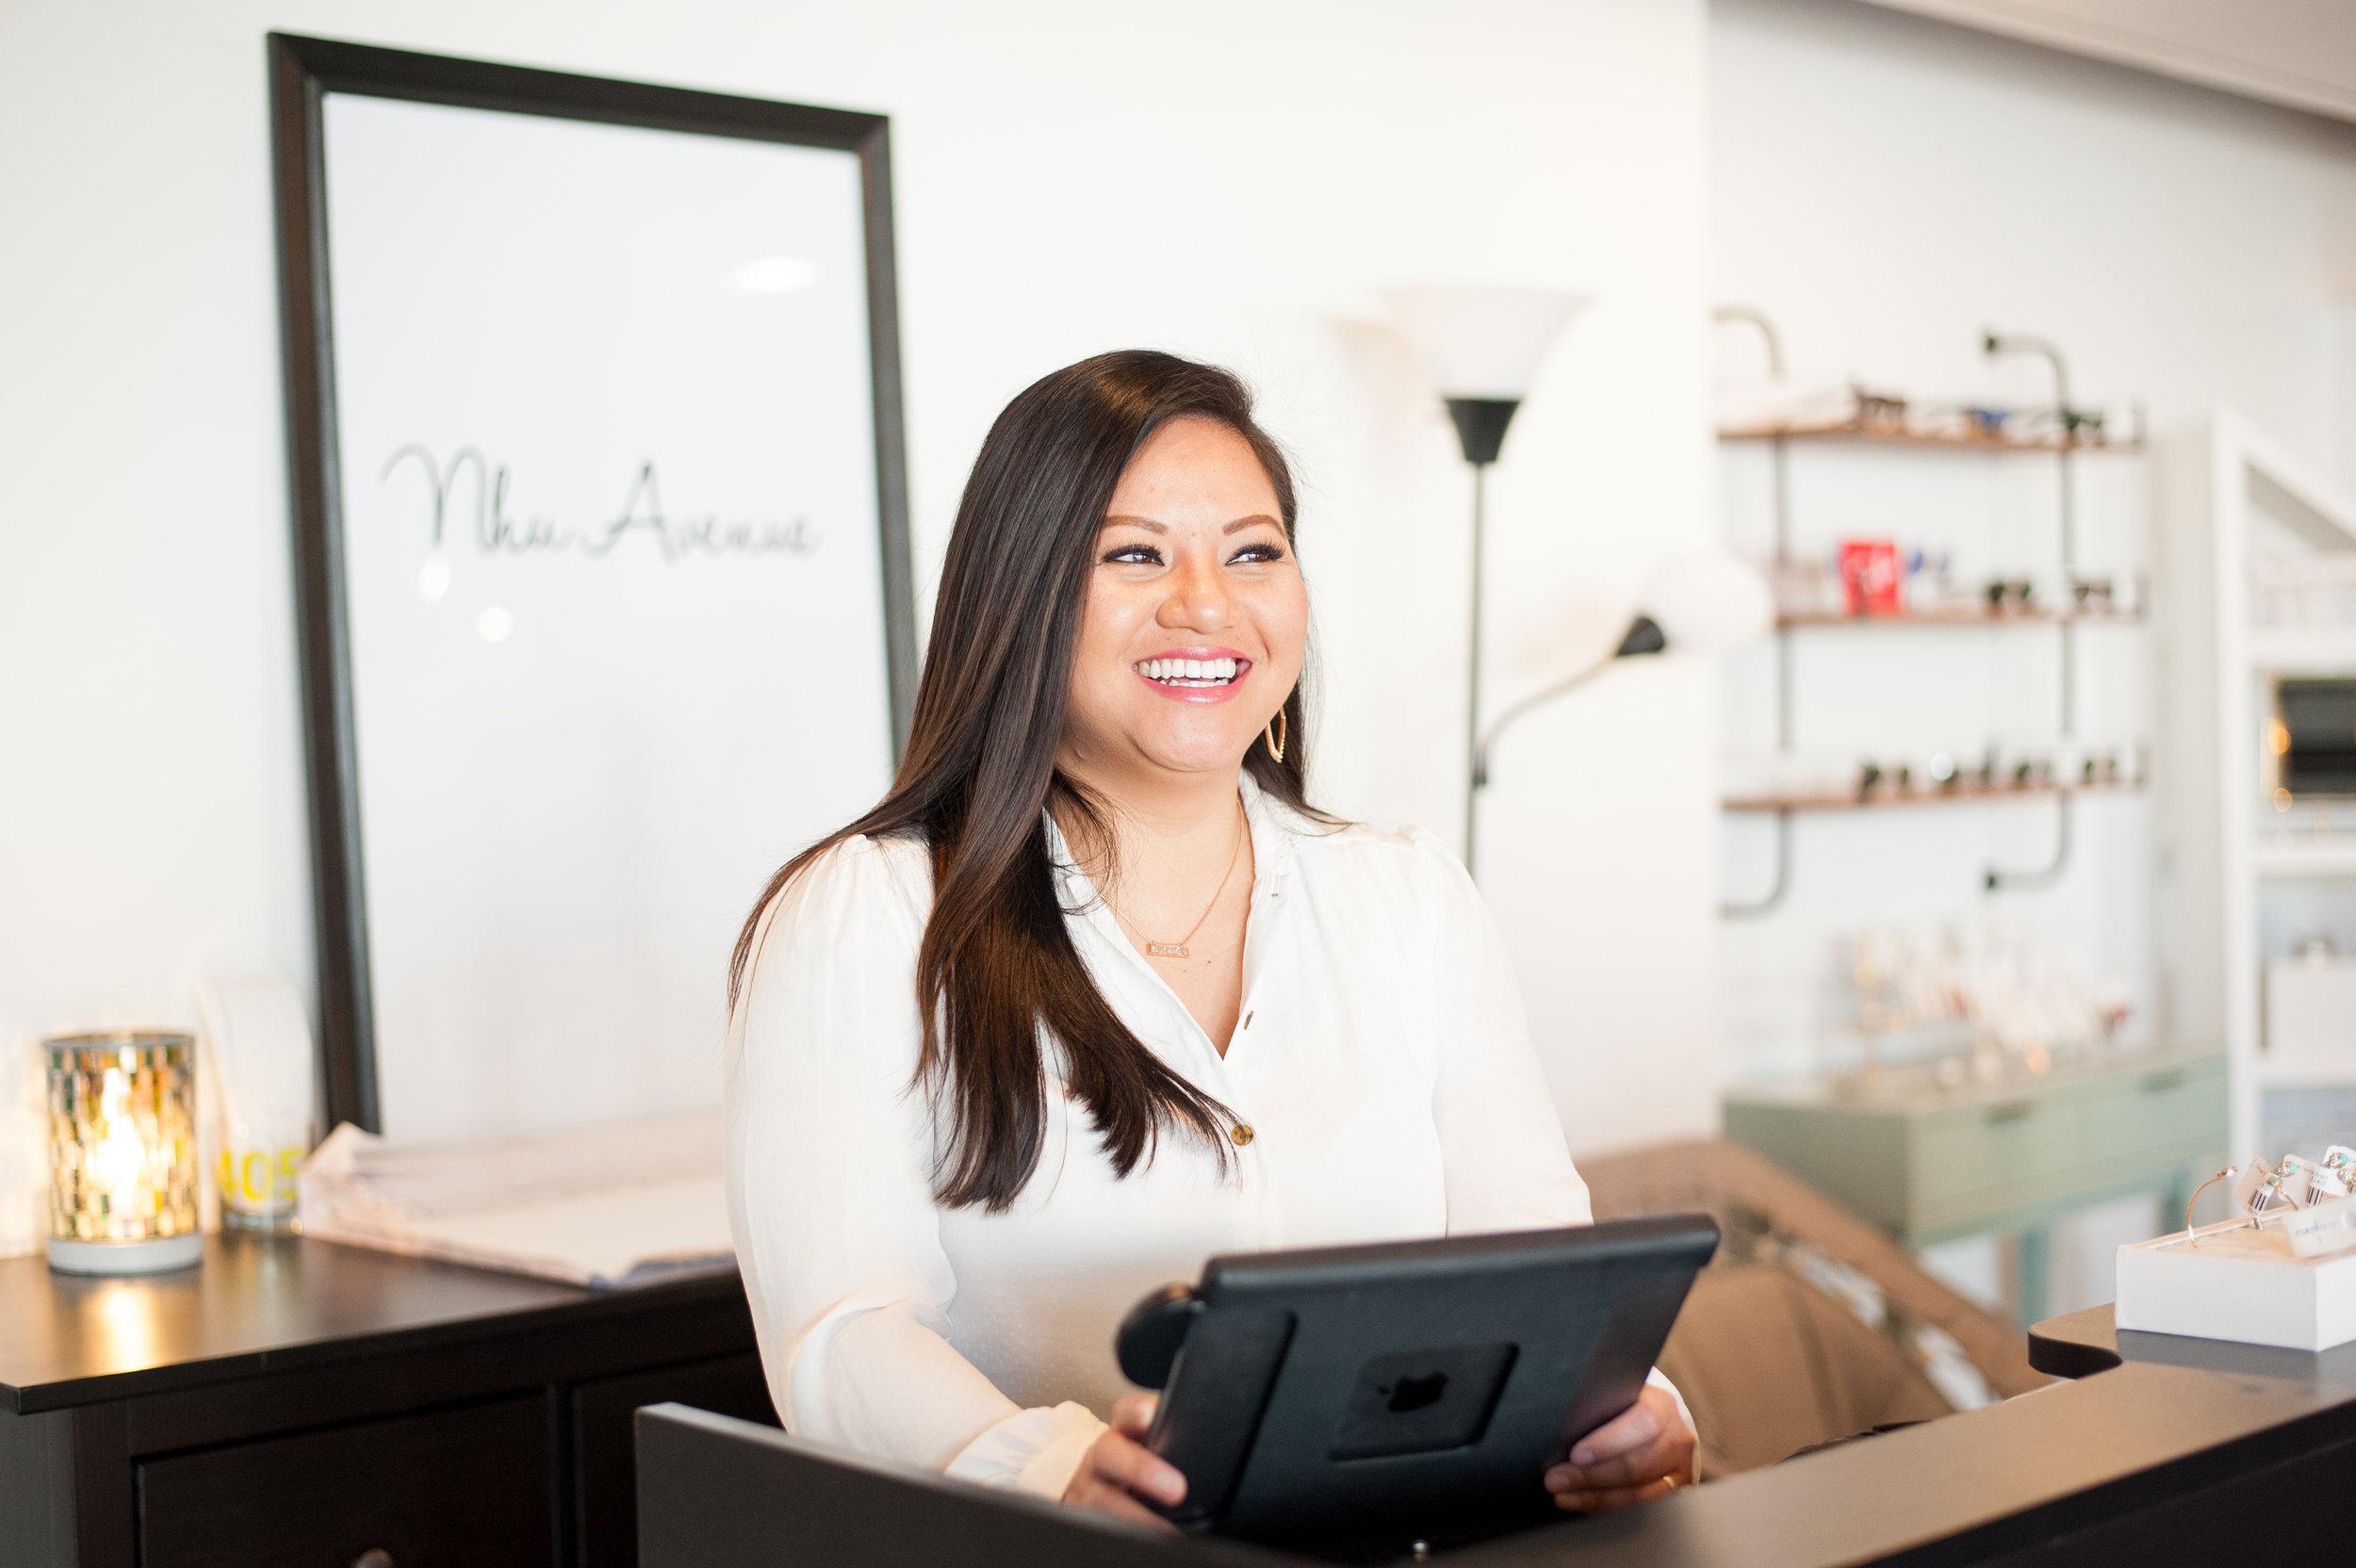 Empowering Women of Oklahoma - Lanh Nguyen, Owner of Nhu Avenue